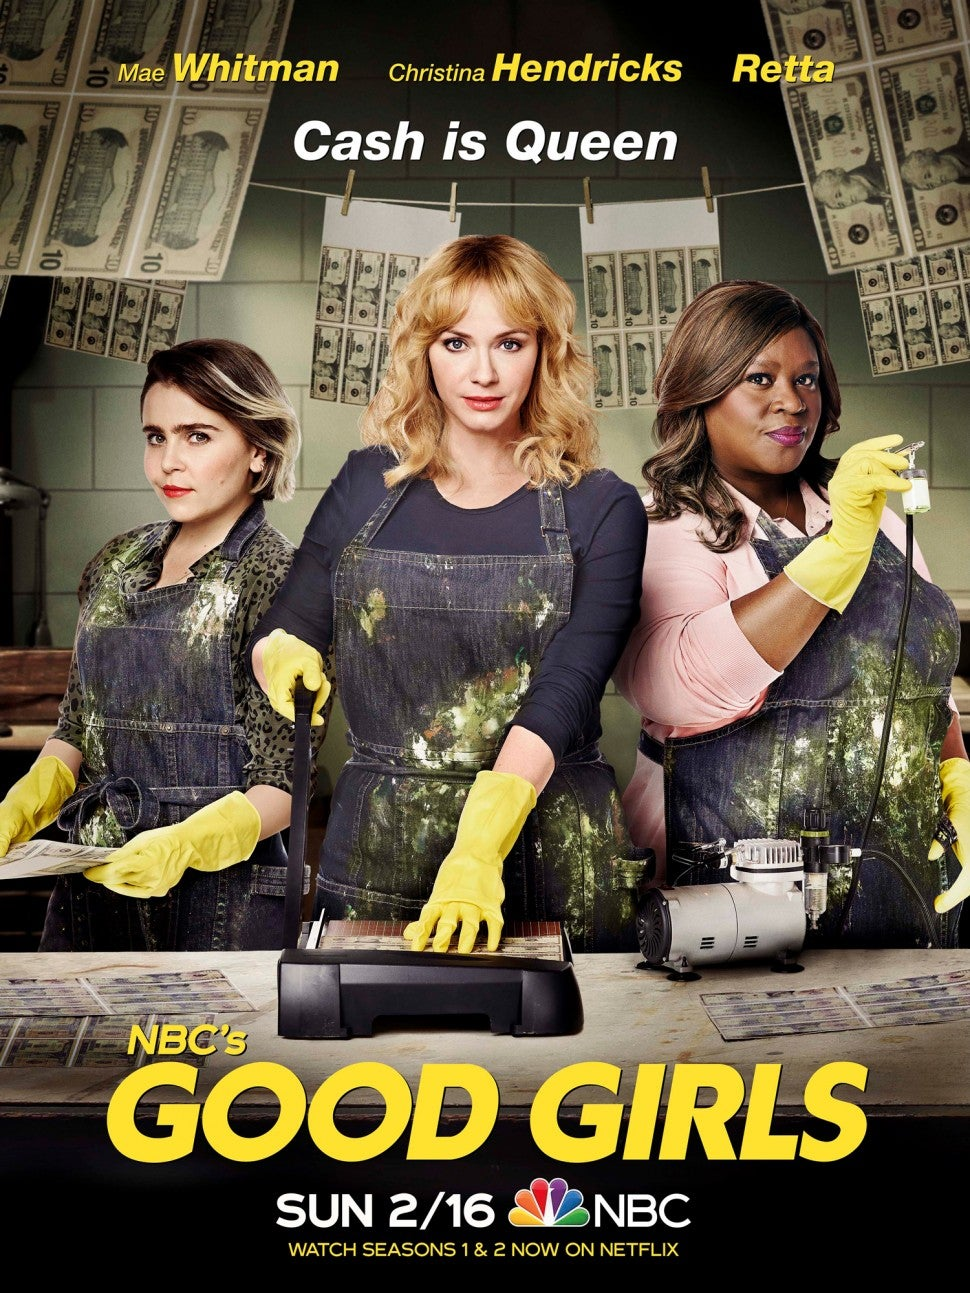 Good Girls - Series 3 Air-Edel